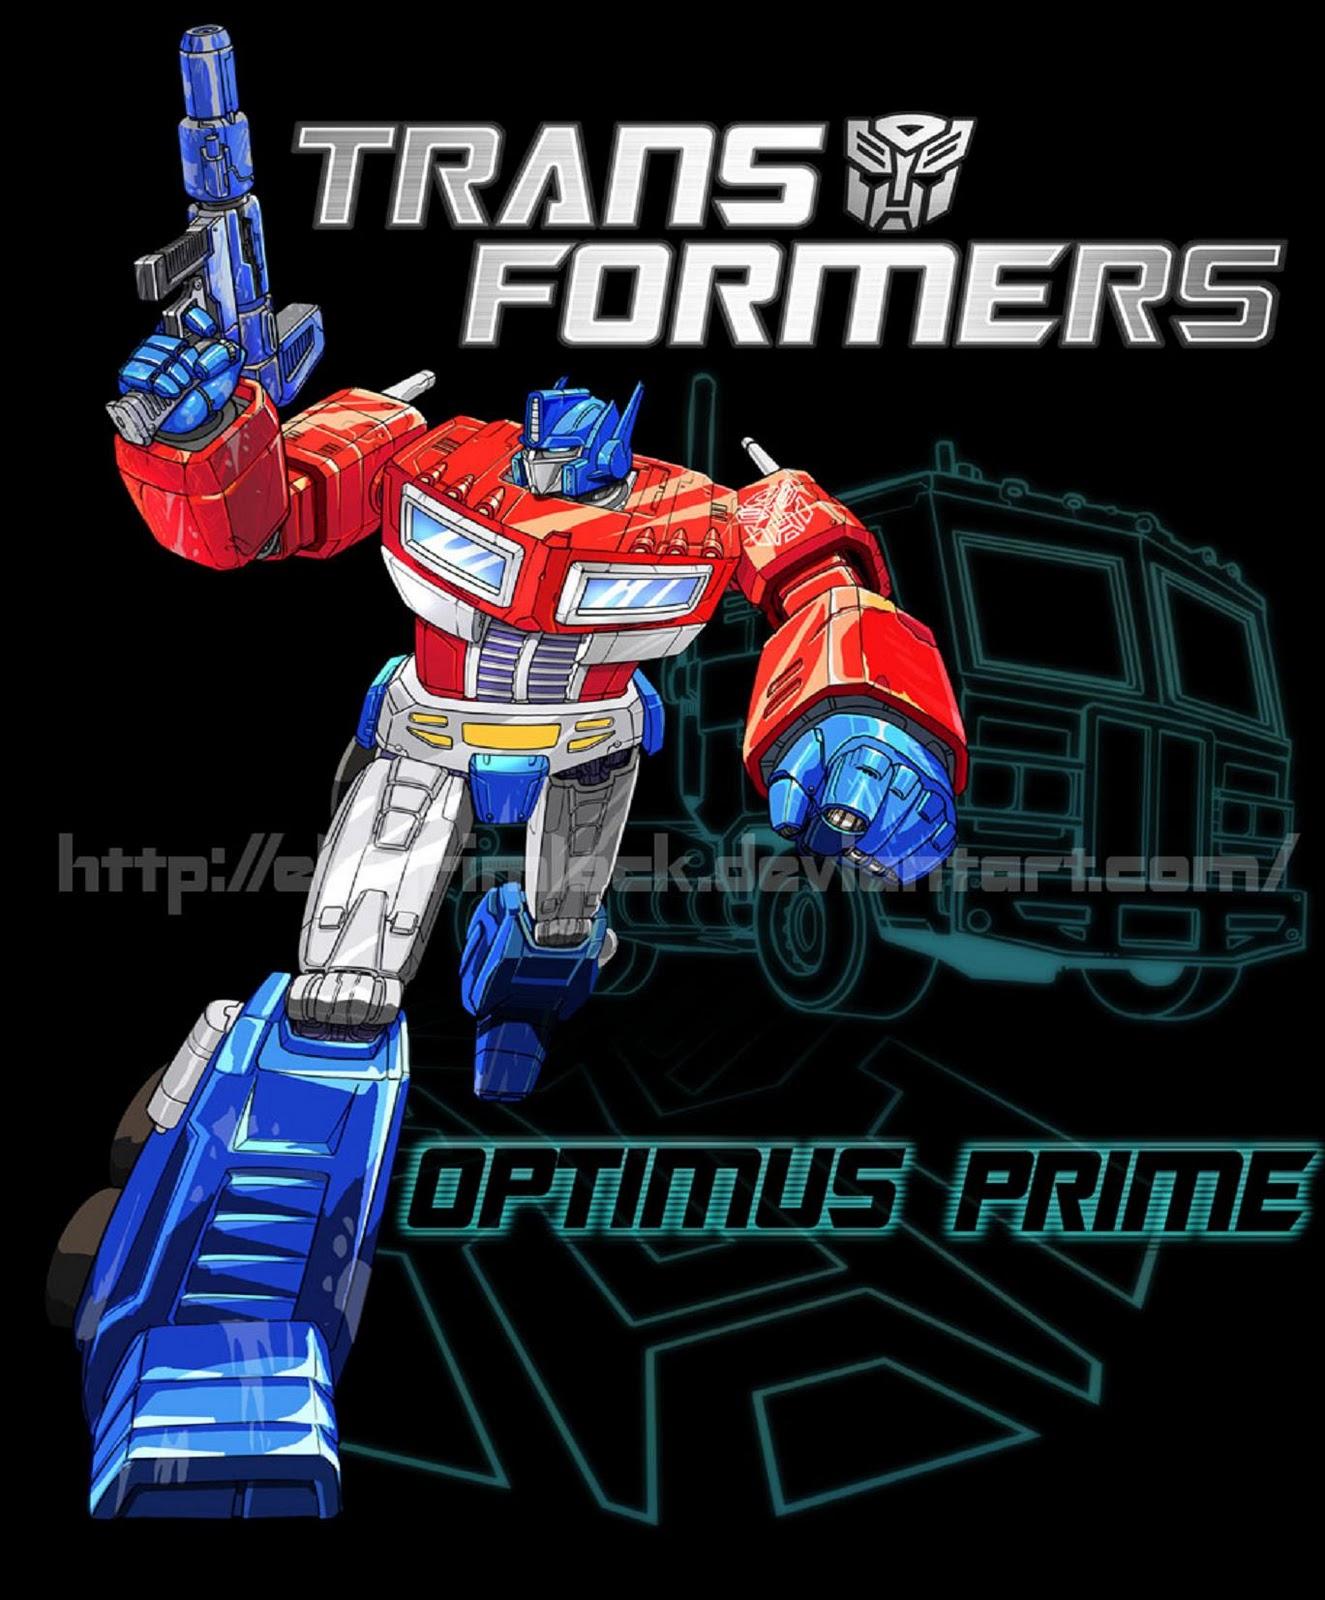 Transformers Prime Hd Wallpapers Transformers Matrix Wallpapers Optimus Prime G1 3d